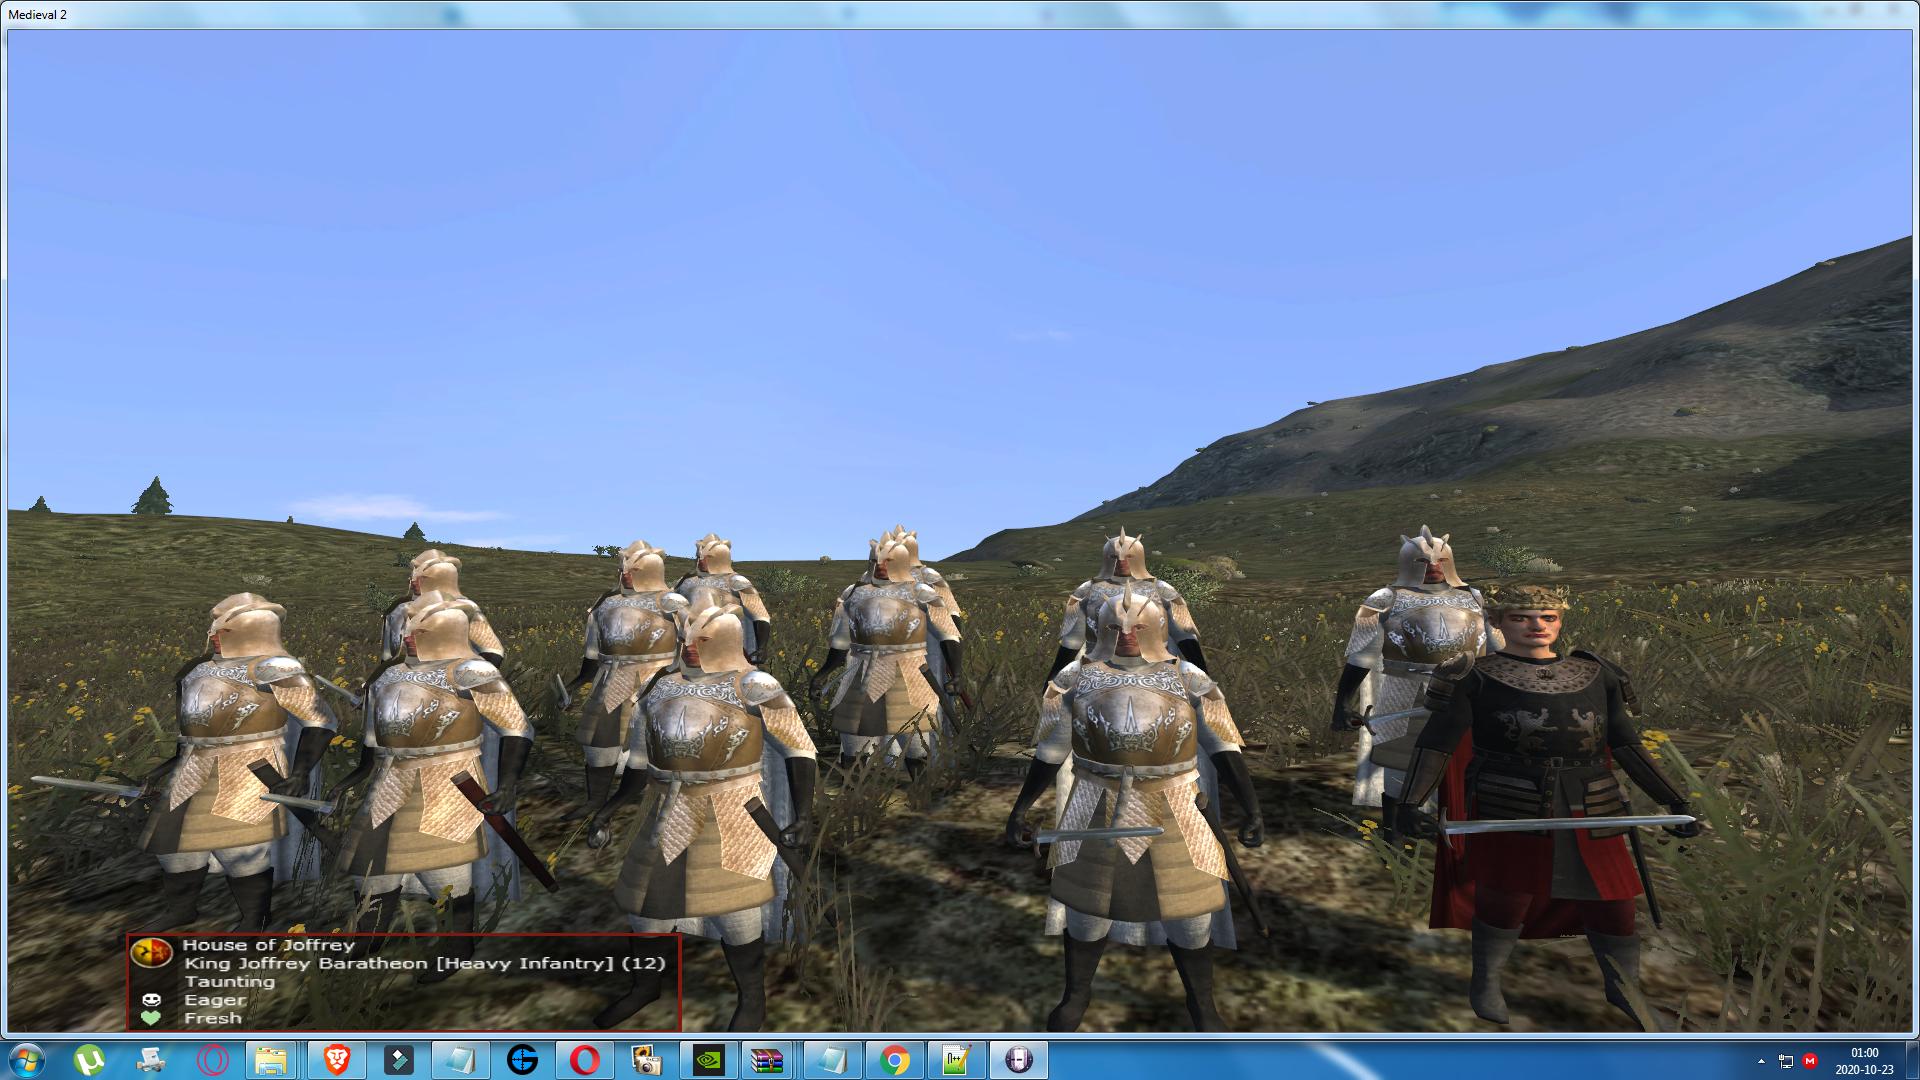 King Joffrey Baratheon hero model updated!